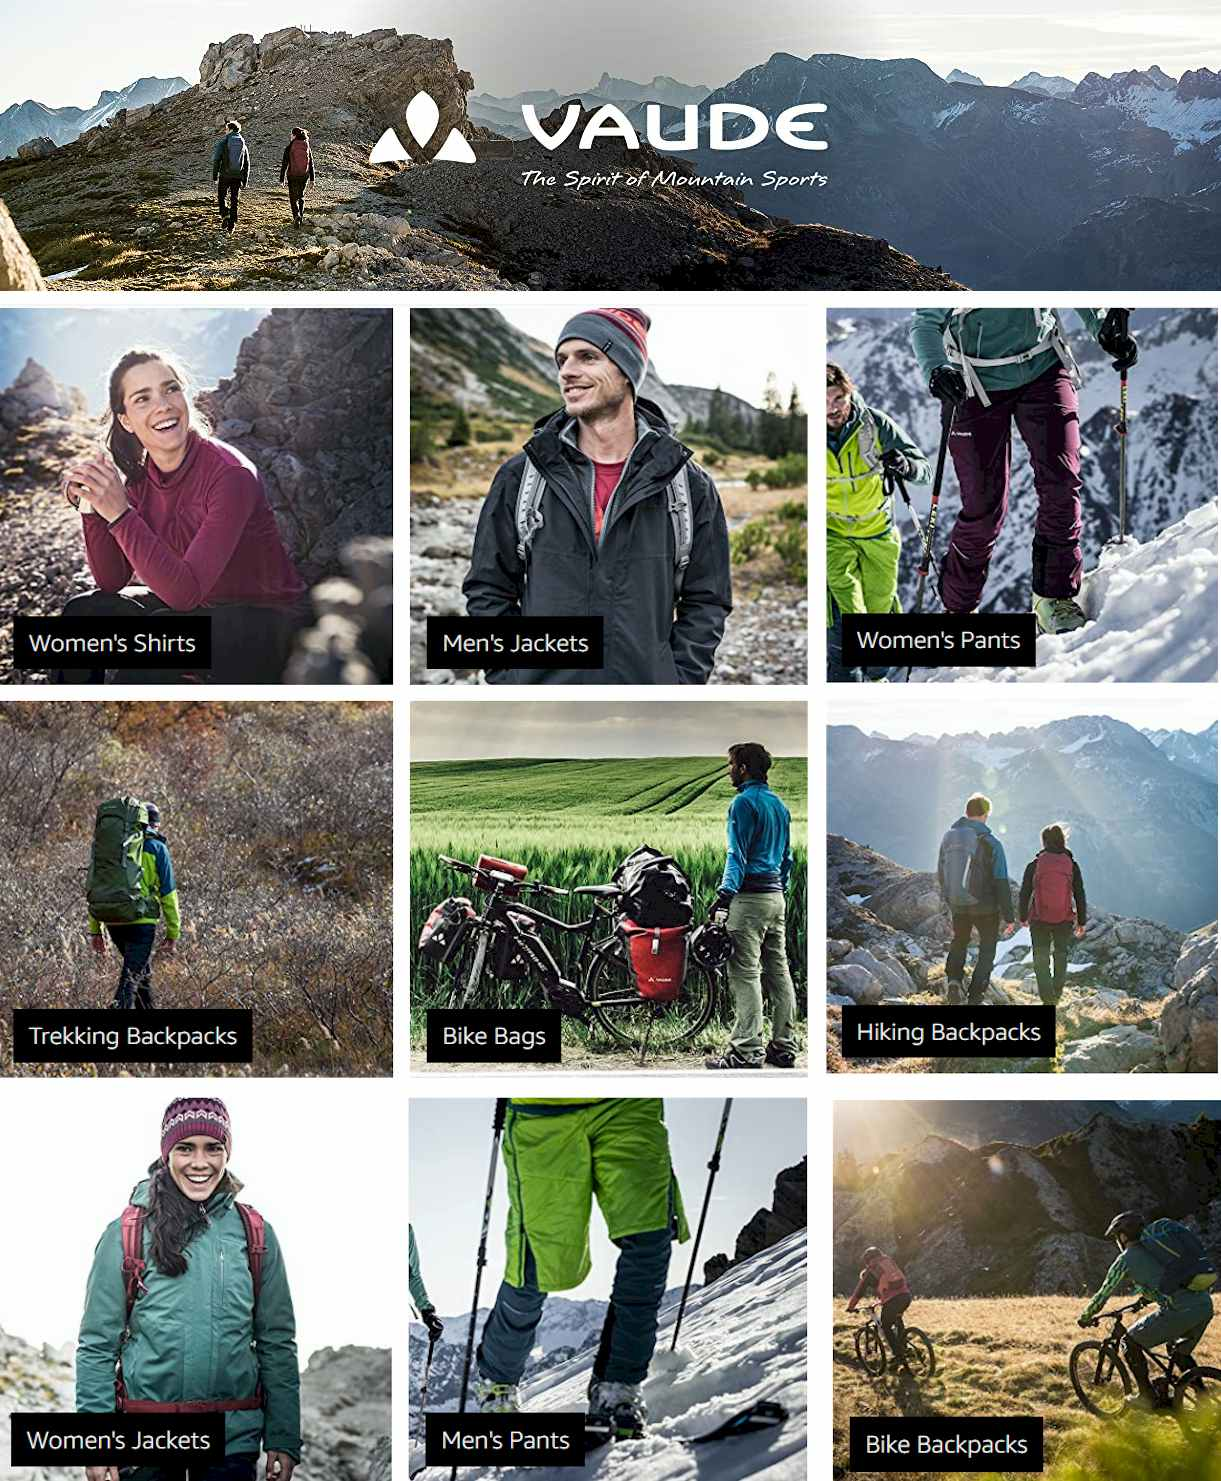 #VAUDE sport wear - #hiking #Trekking #casual #Outdoor #camping #Woman